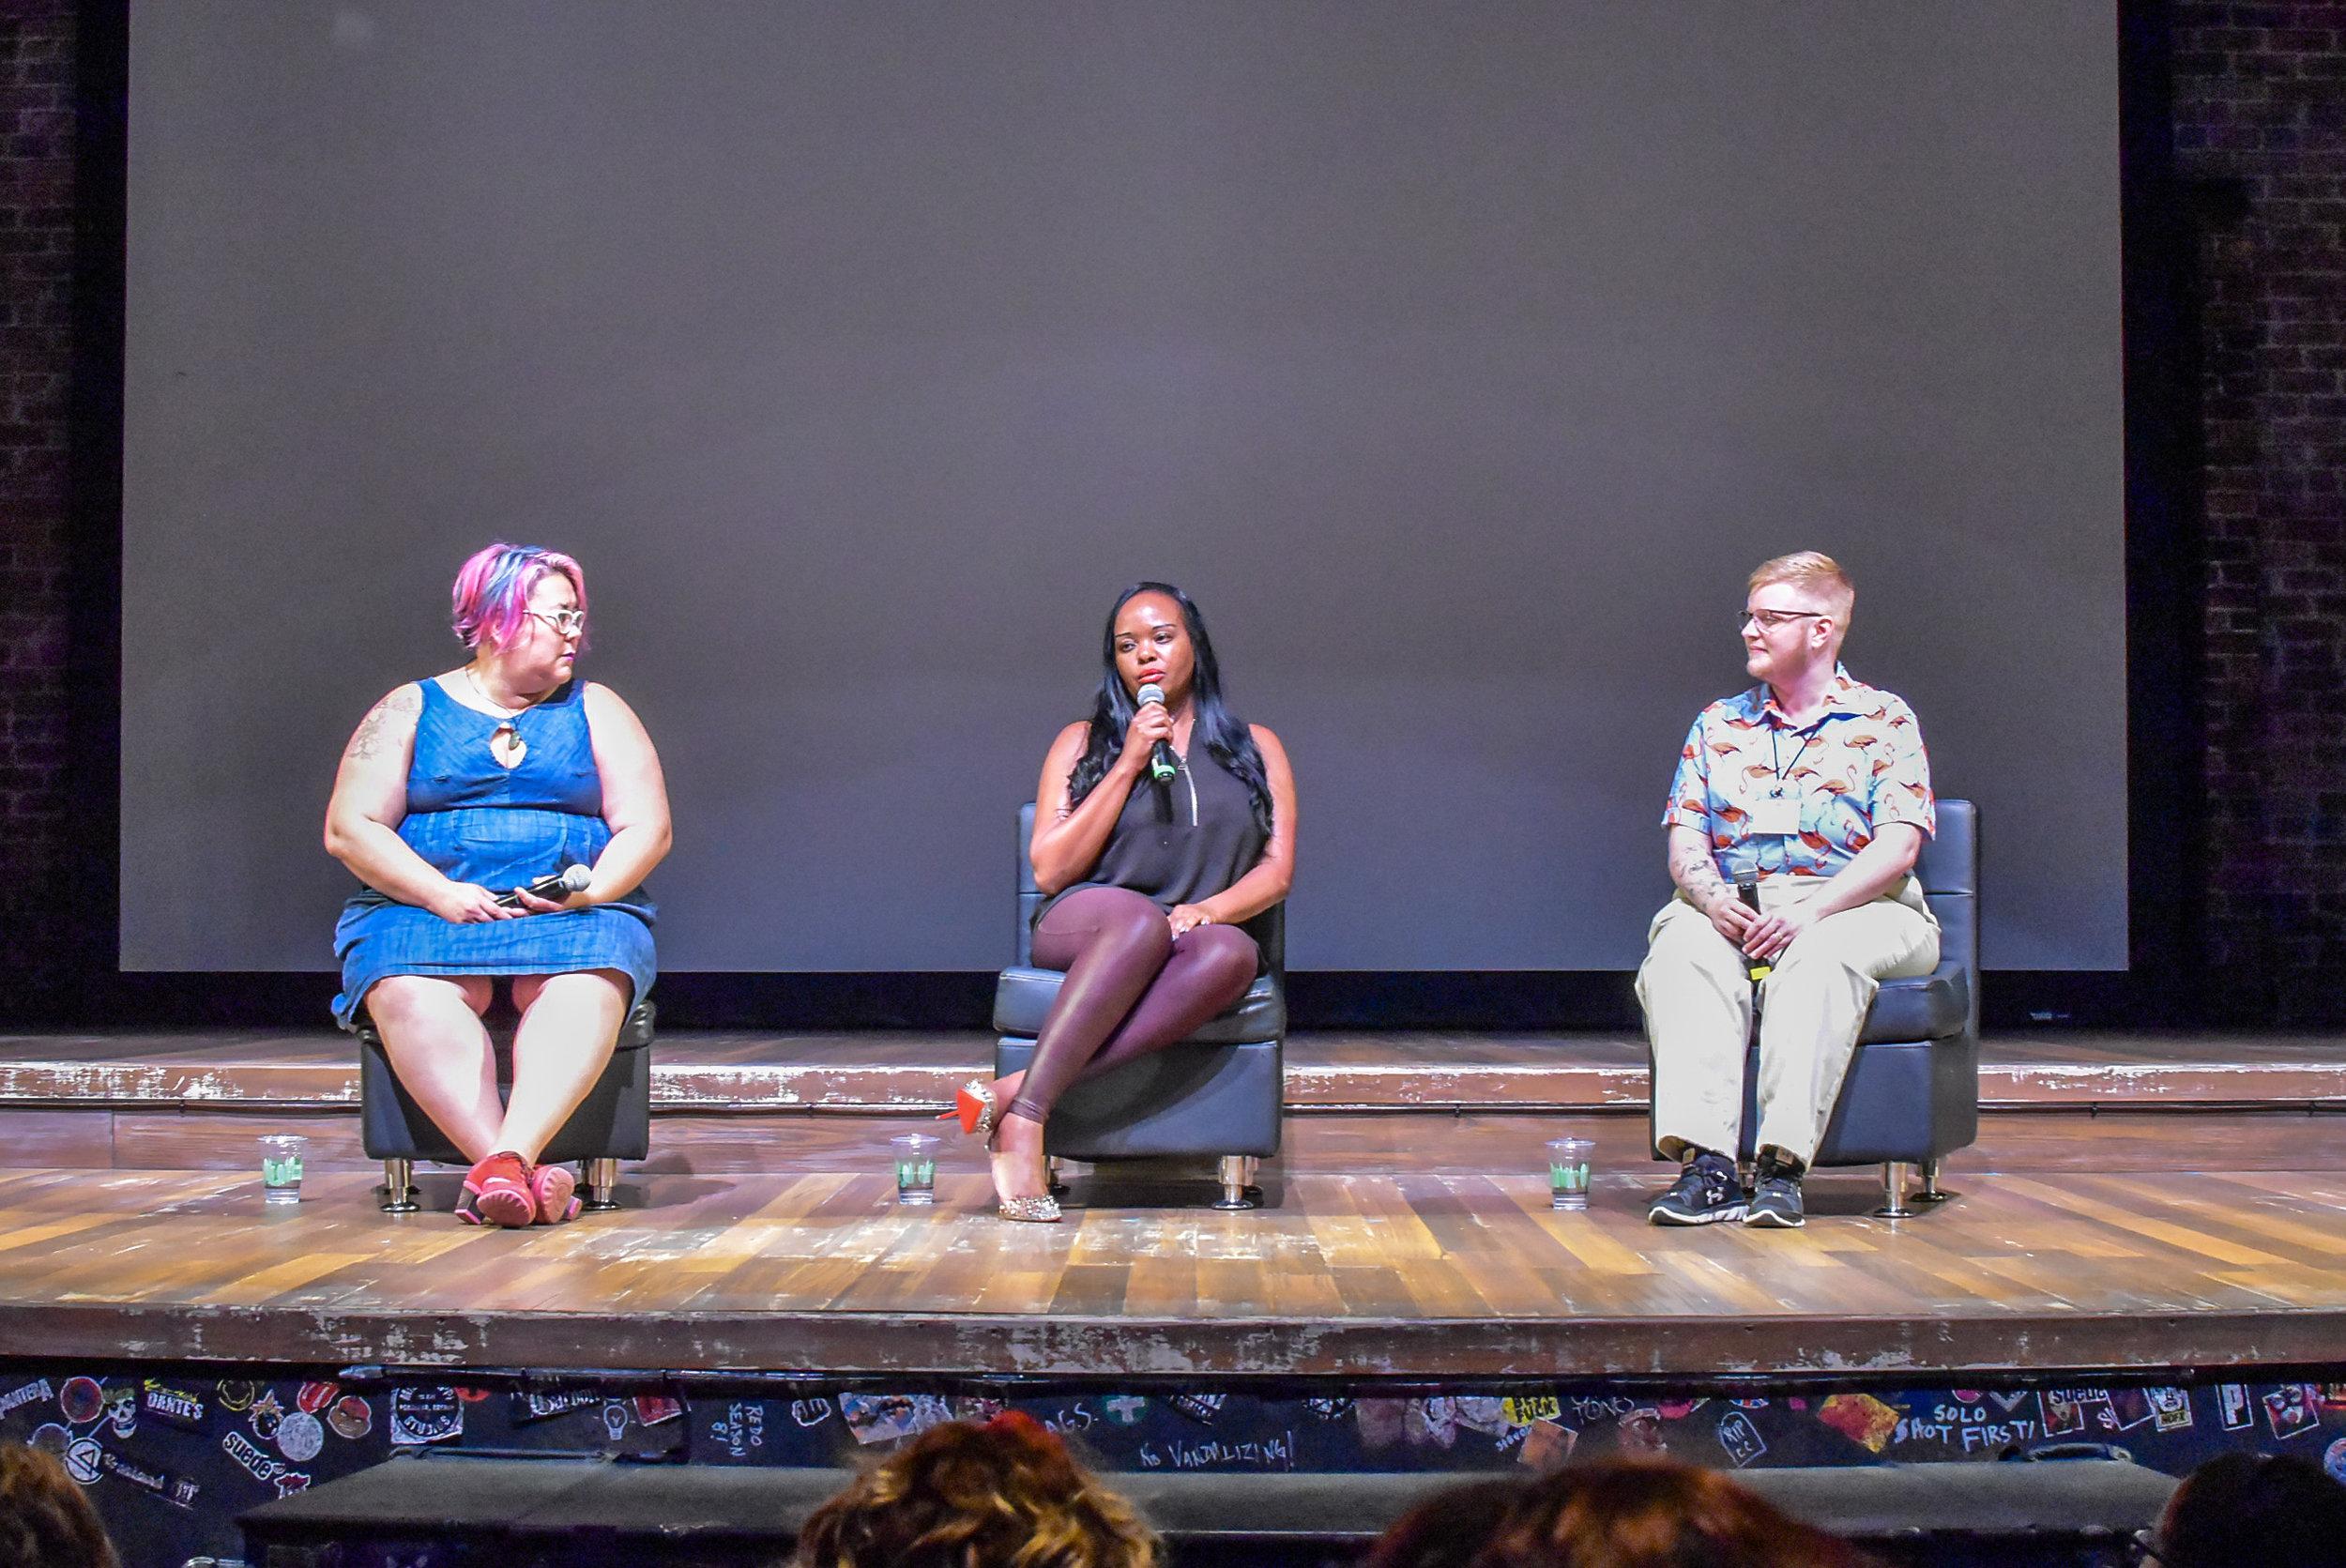 Speaker Esther John on stage with Tara Robertson (left) and Sage Sharp (left) .JPG